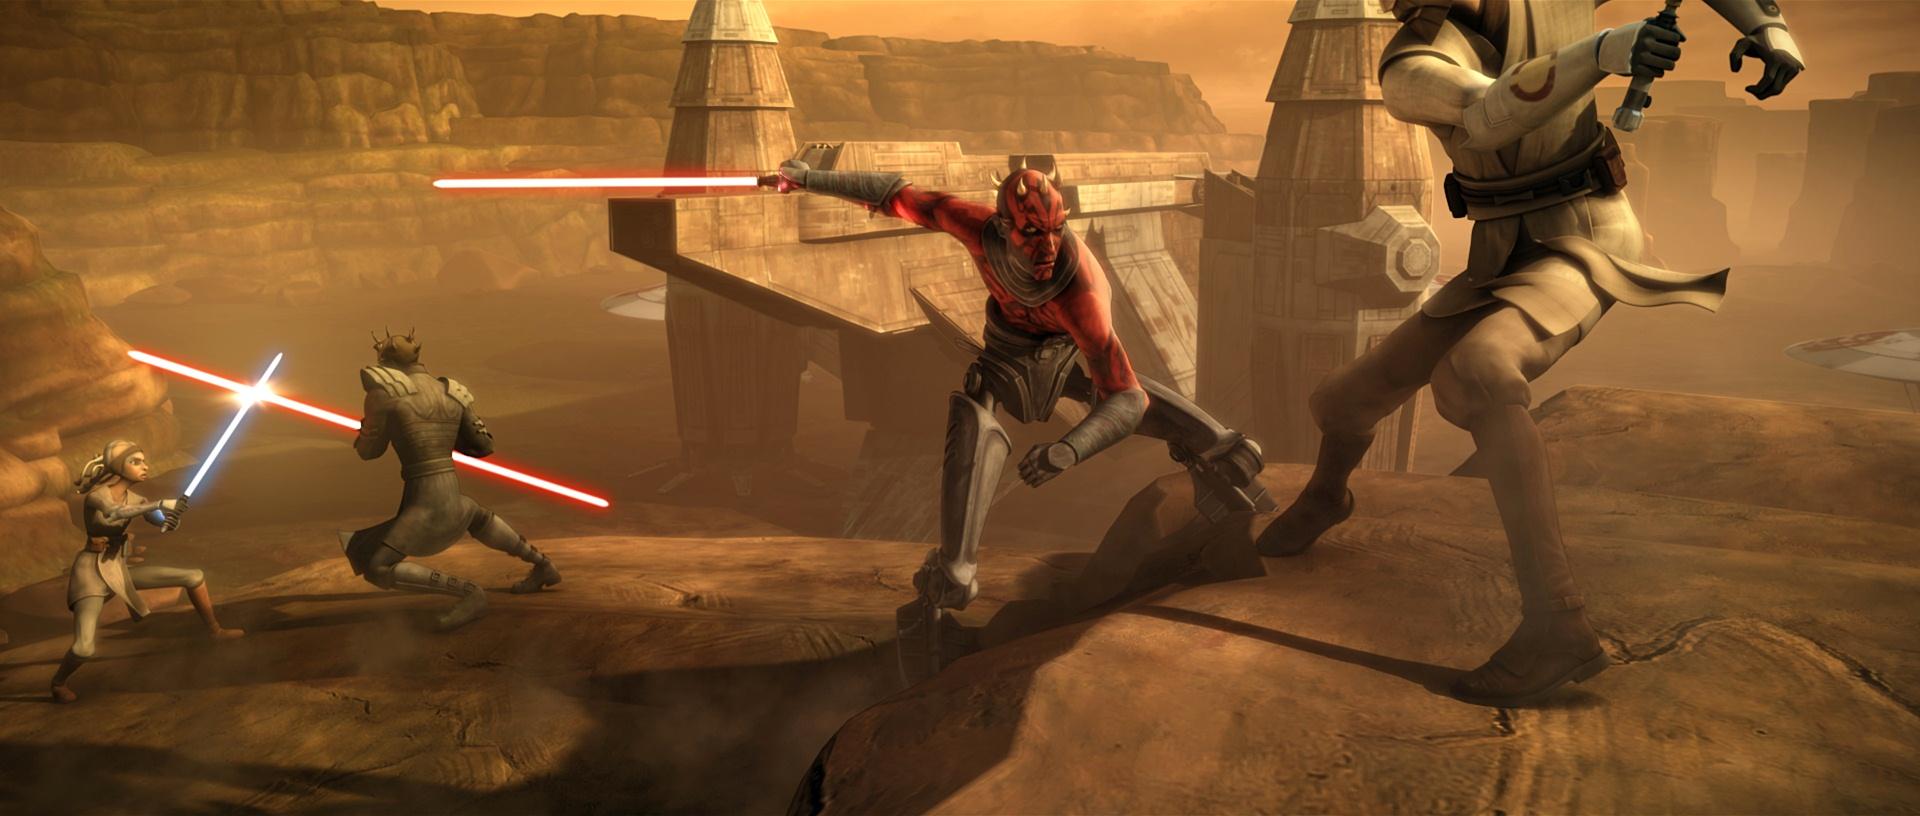 Obi Wan et <a href='/personnage-168-adi-gallia.html' class='motcle'>Adi Gallia</a> sur Florrum